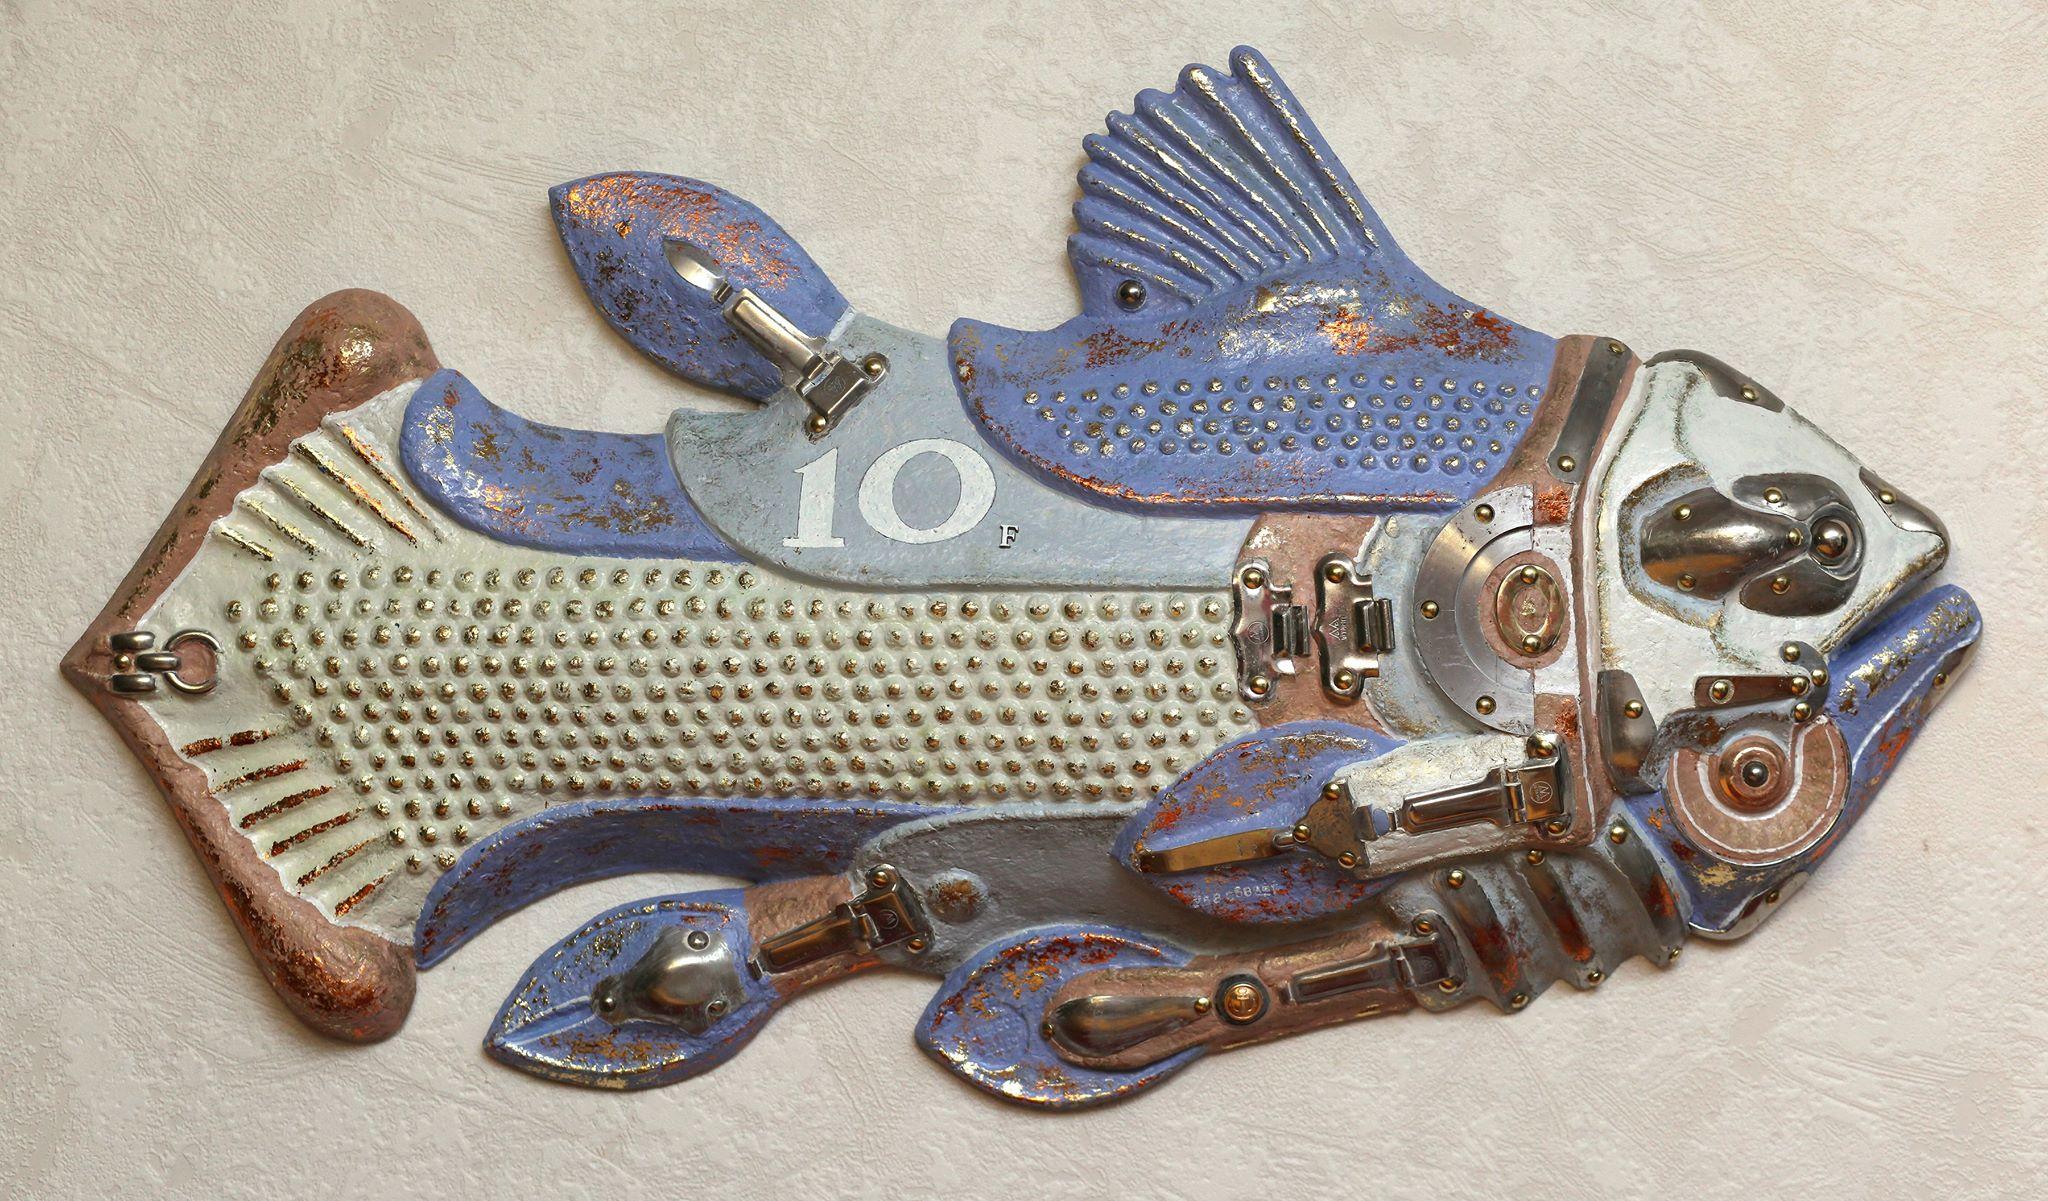 Страж -1. Триптих «Страж глубин».   2016 г.    Металл, папье-маше.   (100 х 66 см.)